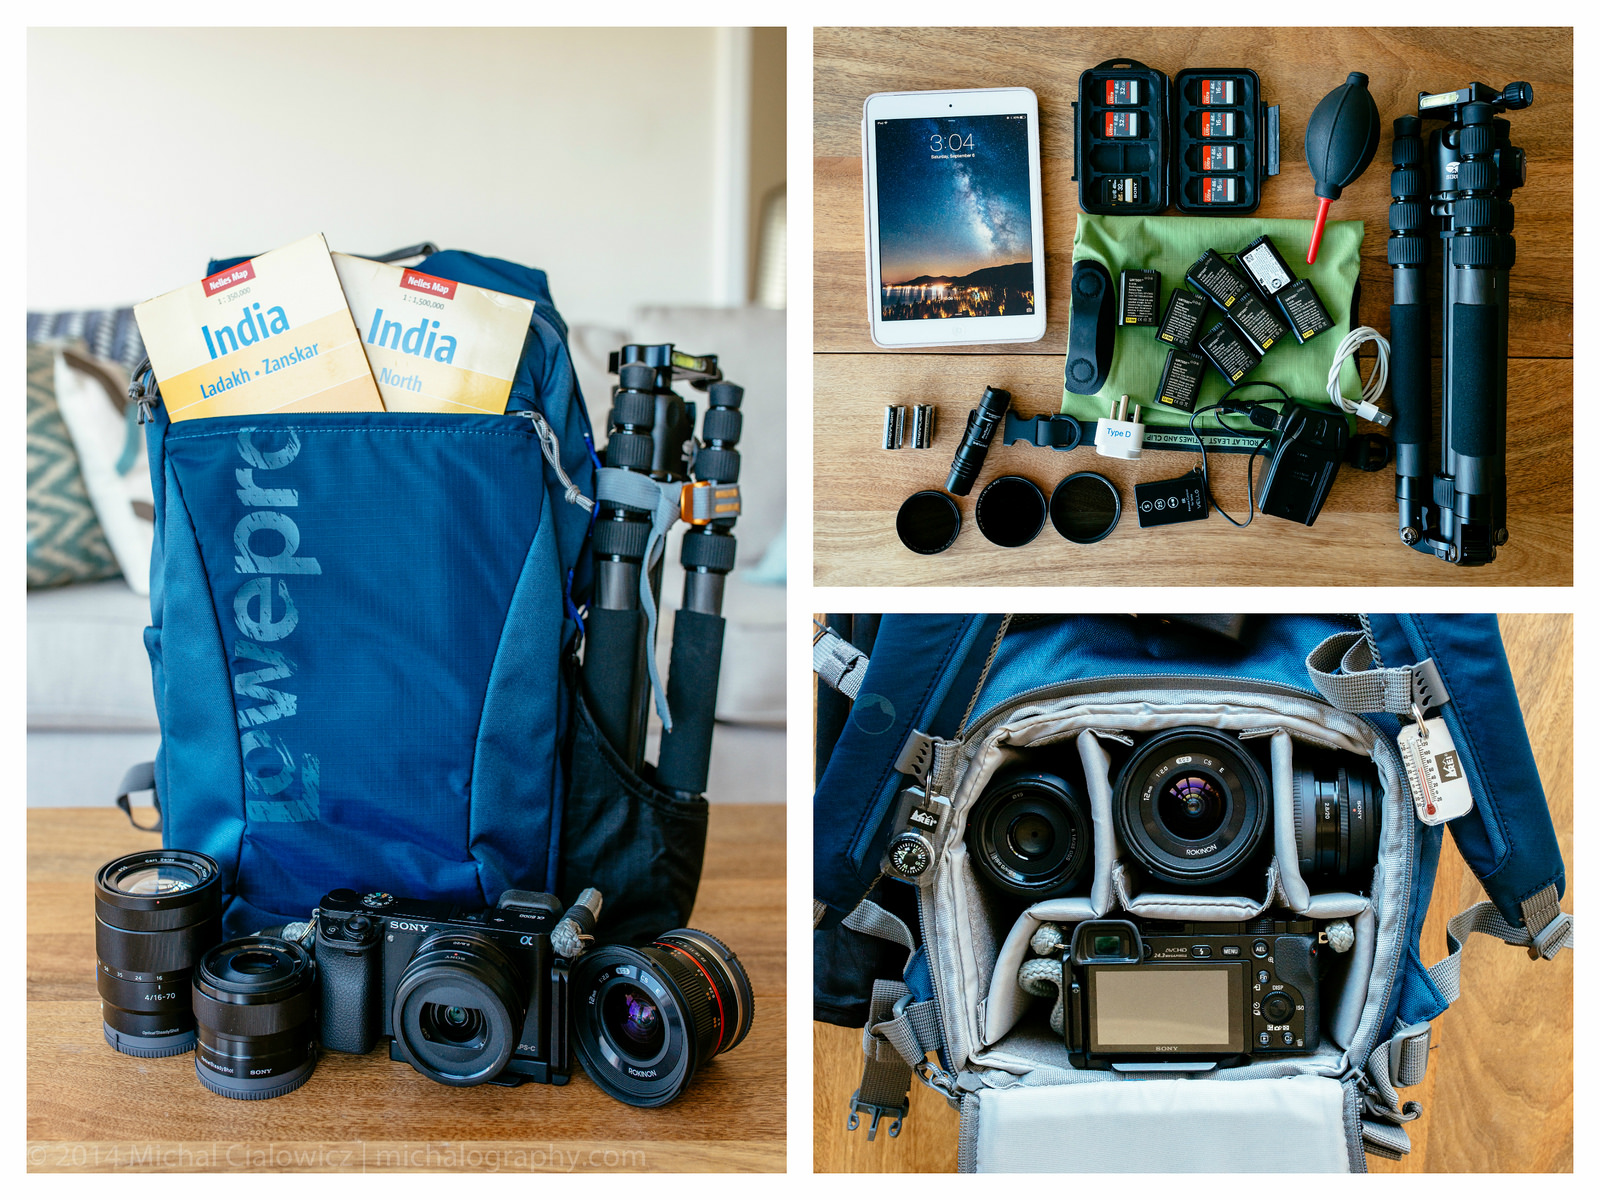 A6000 Travel Kit